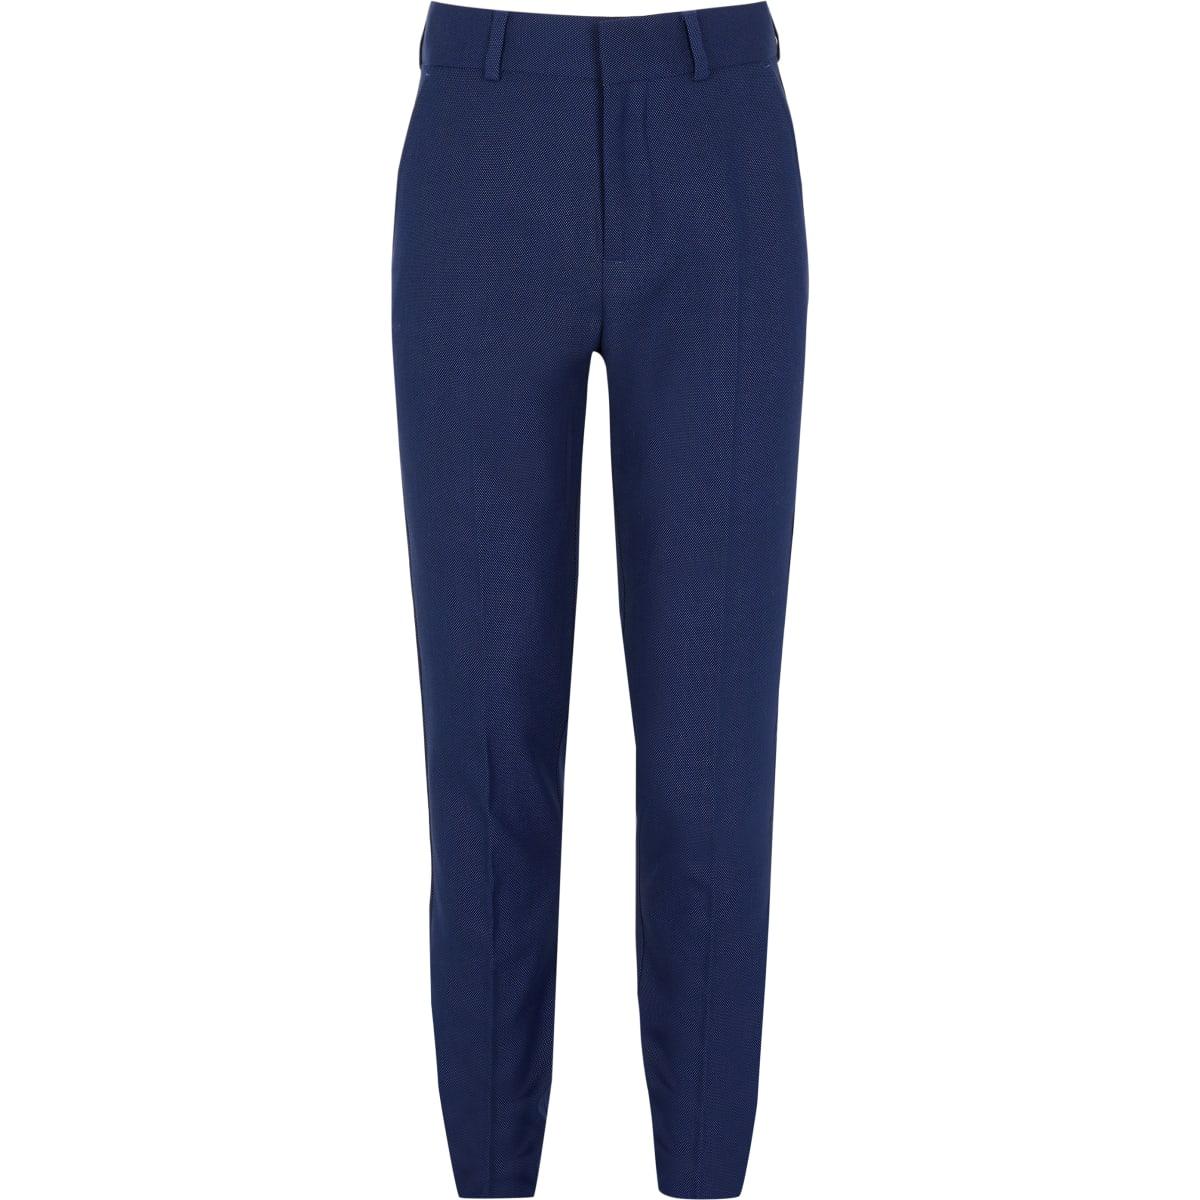 Marineblauwe slim-fit pantalon met stippenprint voor jongens